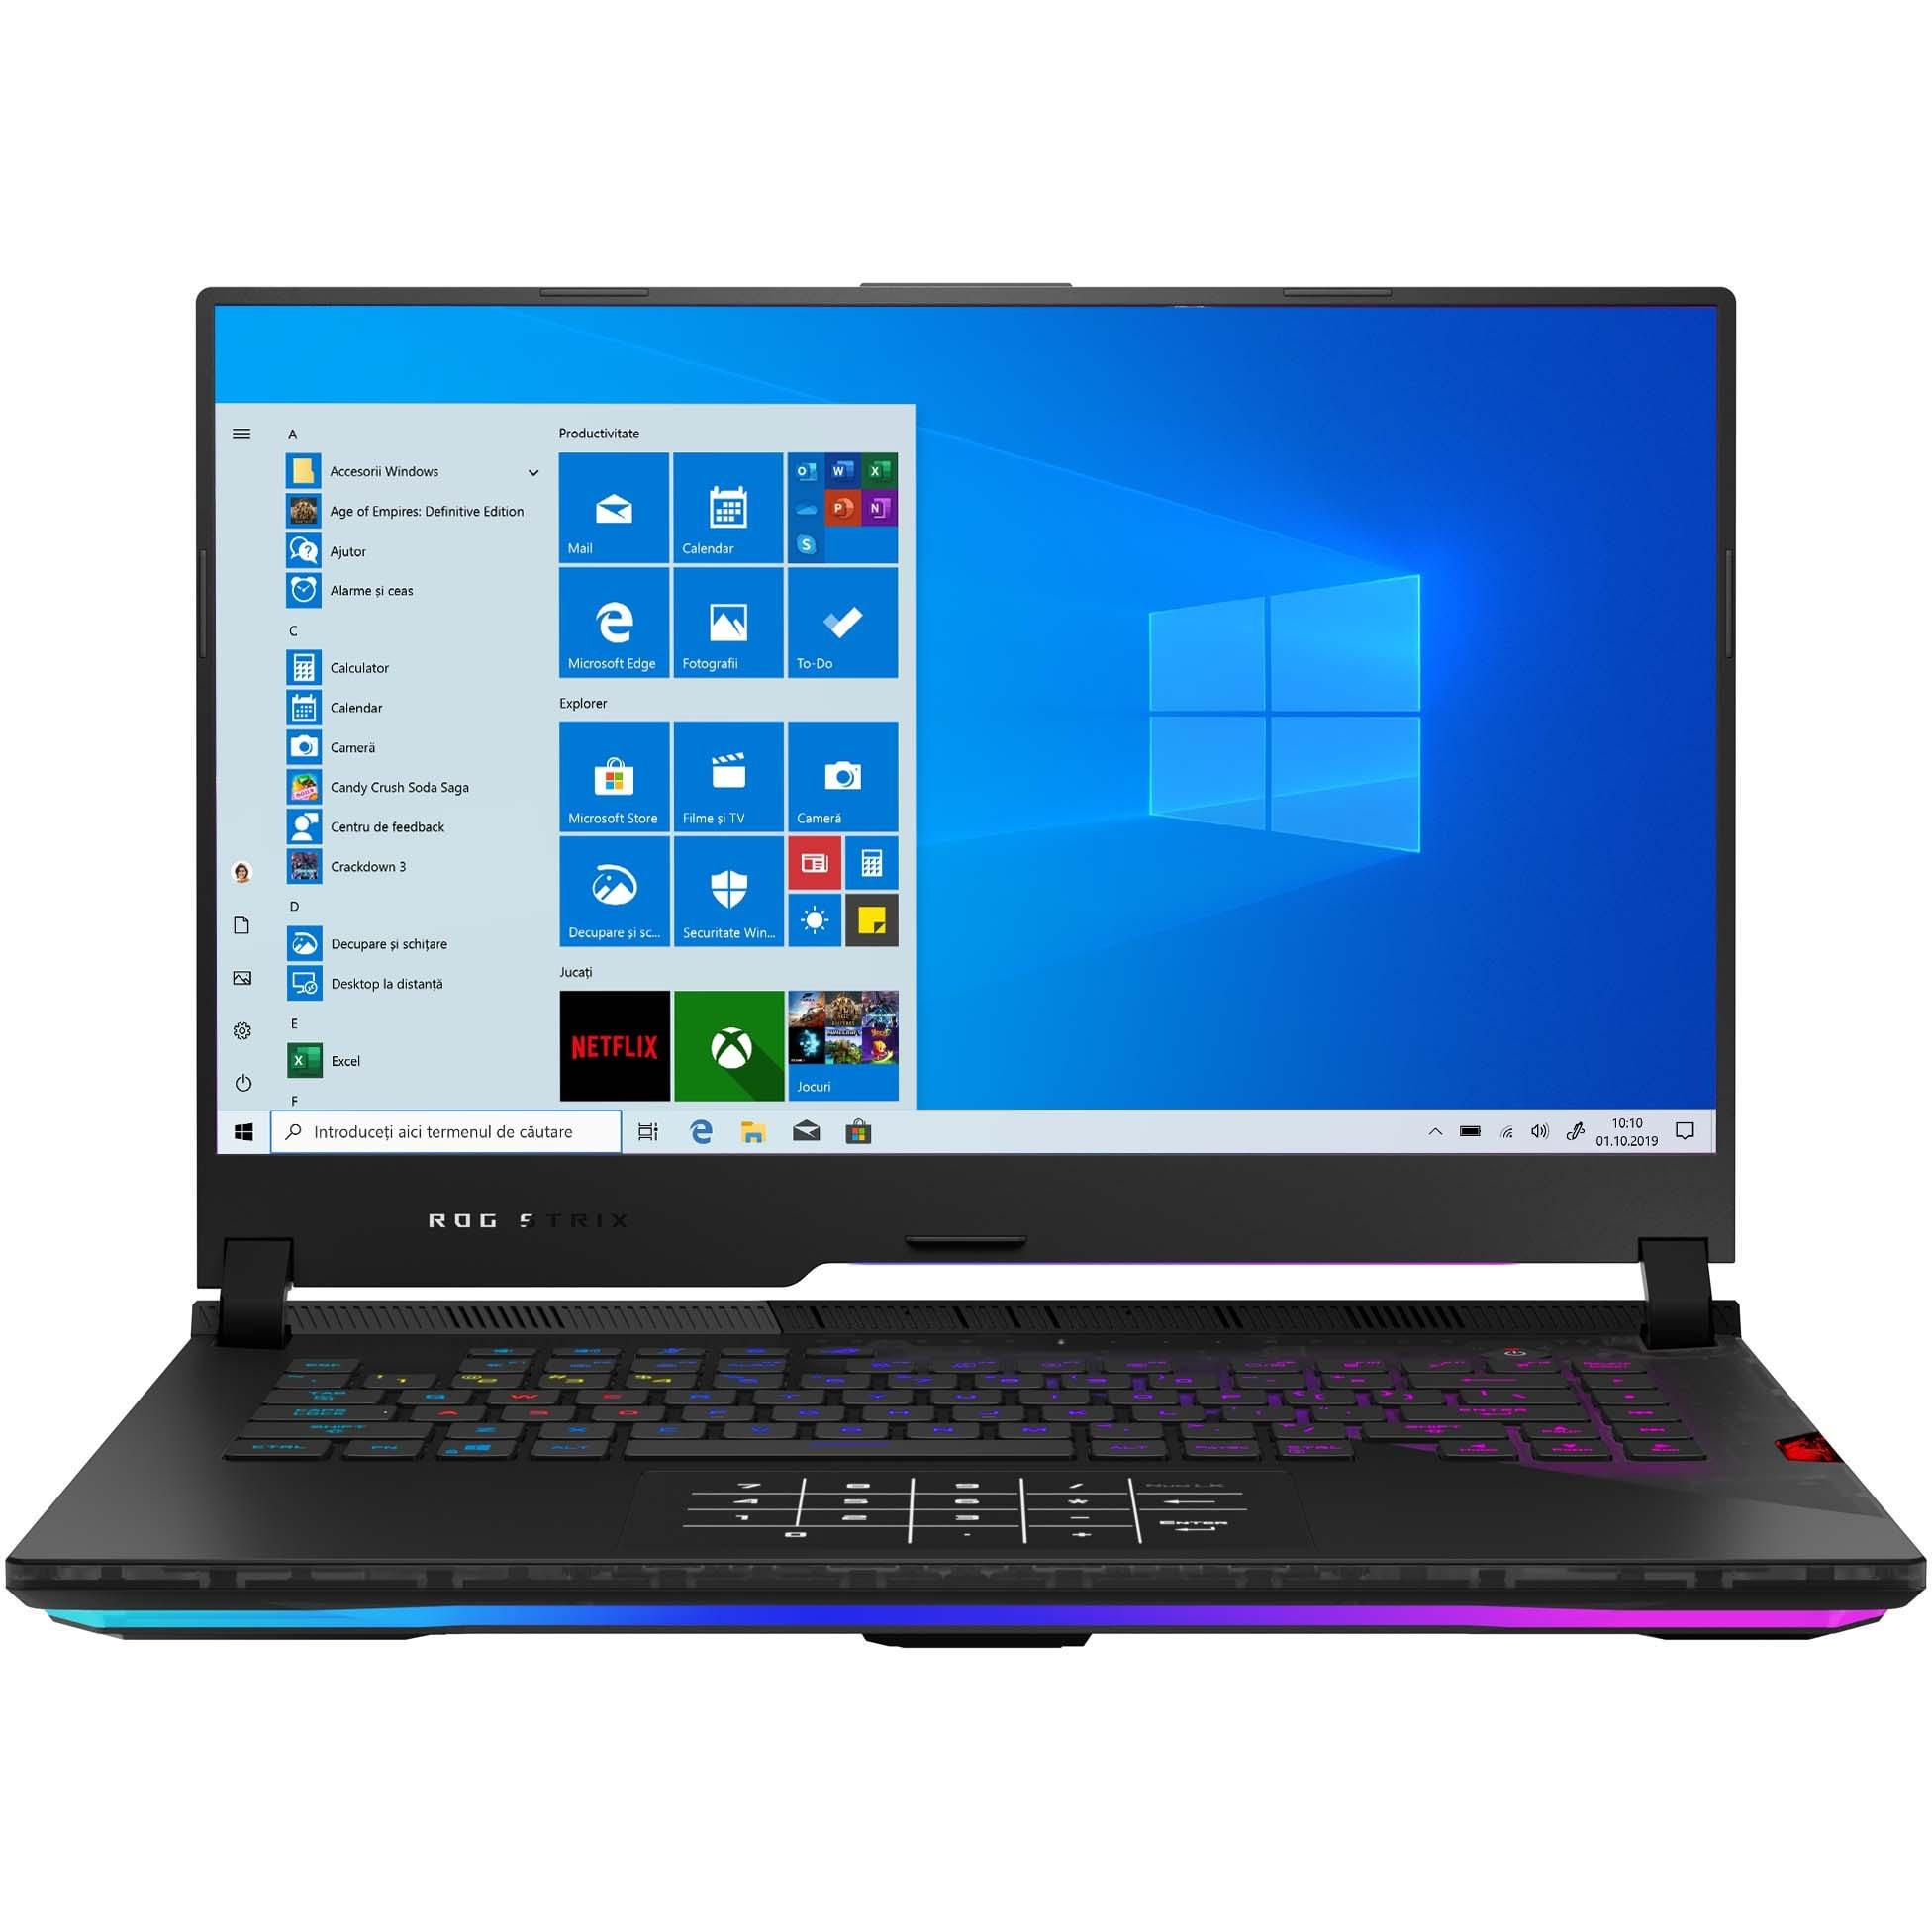 "Fotografie Laptop Gaming ASUS ROG Strix SCAR 15 G533QS cu procesor AMD Ryzen™ 7 5800H pana la 4.40 GHz, 15.6"", Full HD, 300Hz, 16GB, 1TB SSD, NVIDIA® GeForce RTX™ 3080 16GB, Windows 10 Home, Black"